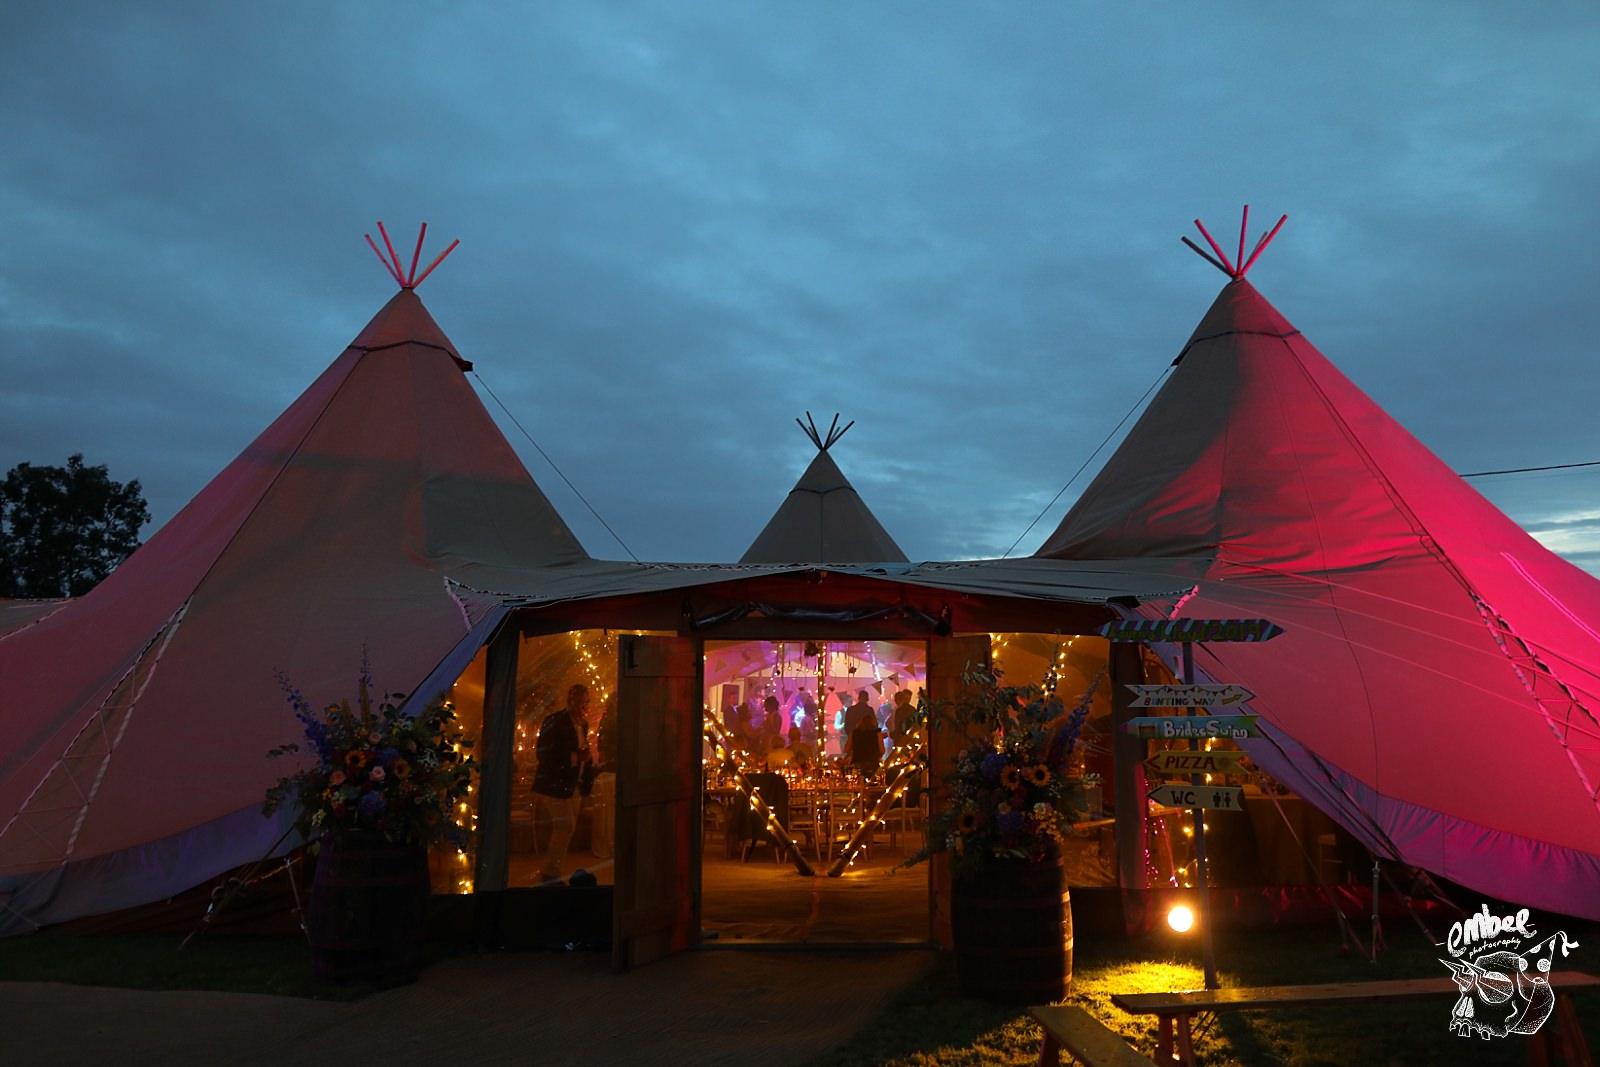 wedding in tipi at night